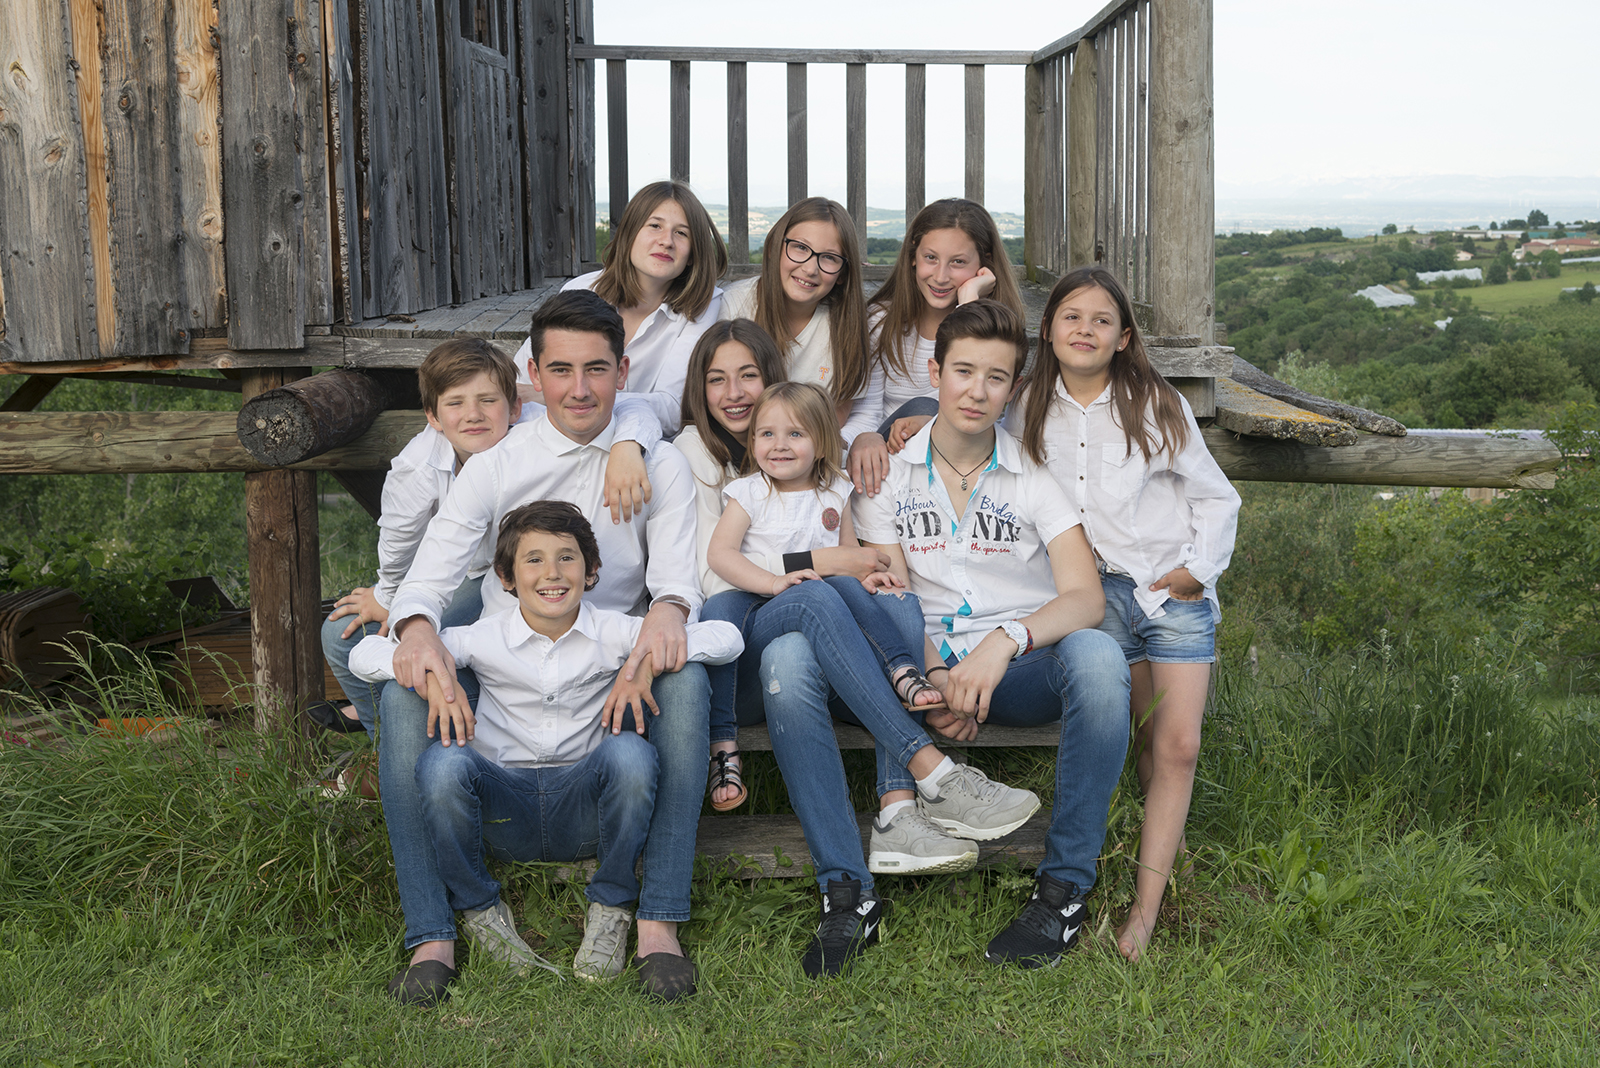 famille cousins ambiance cabane